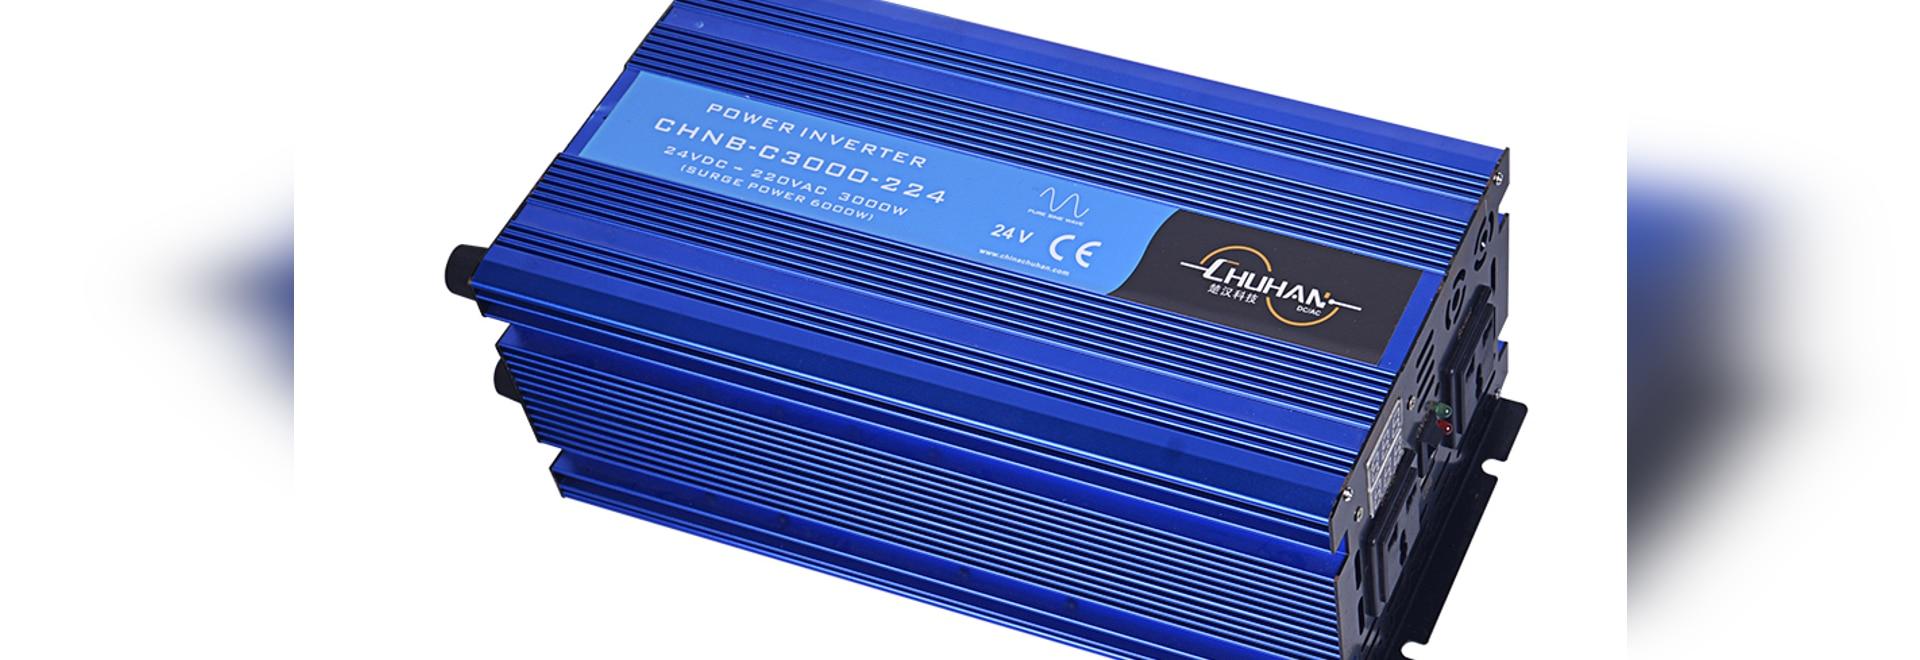 CHUHAN DC/AC Pure sine wave Inverter 3000W